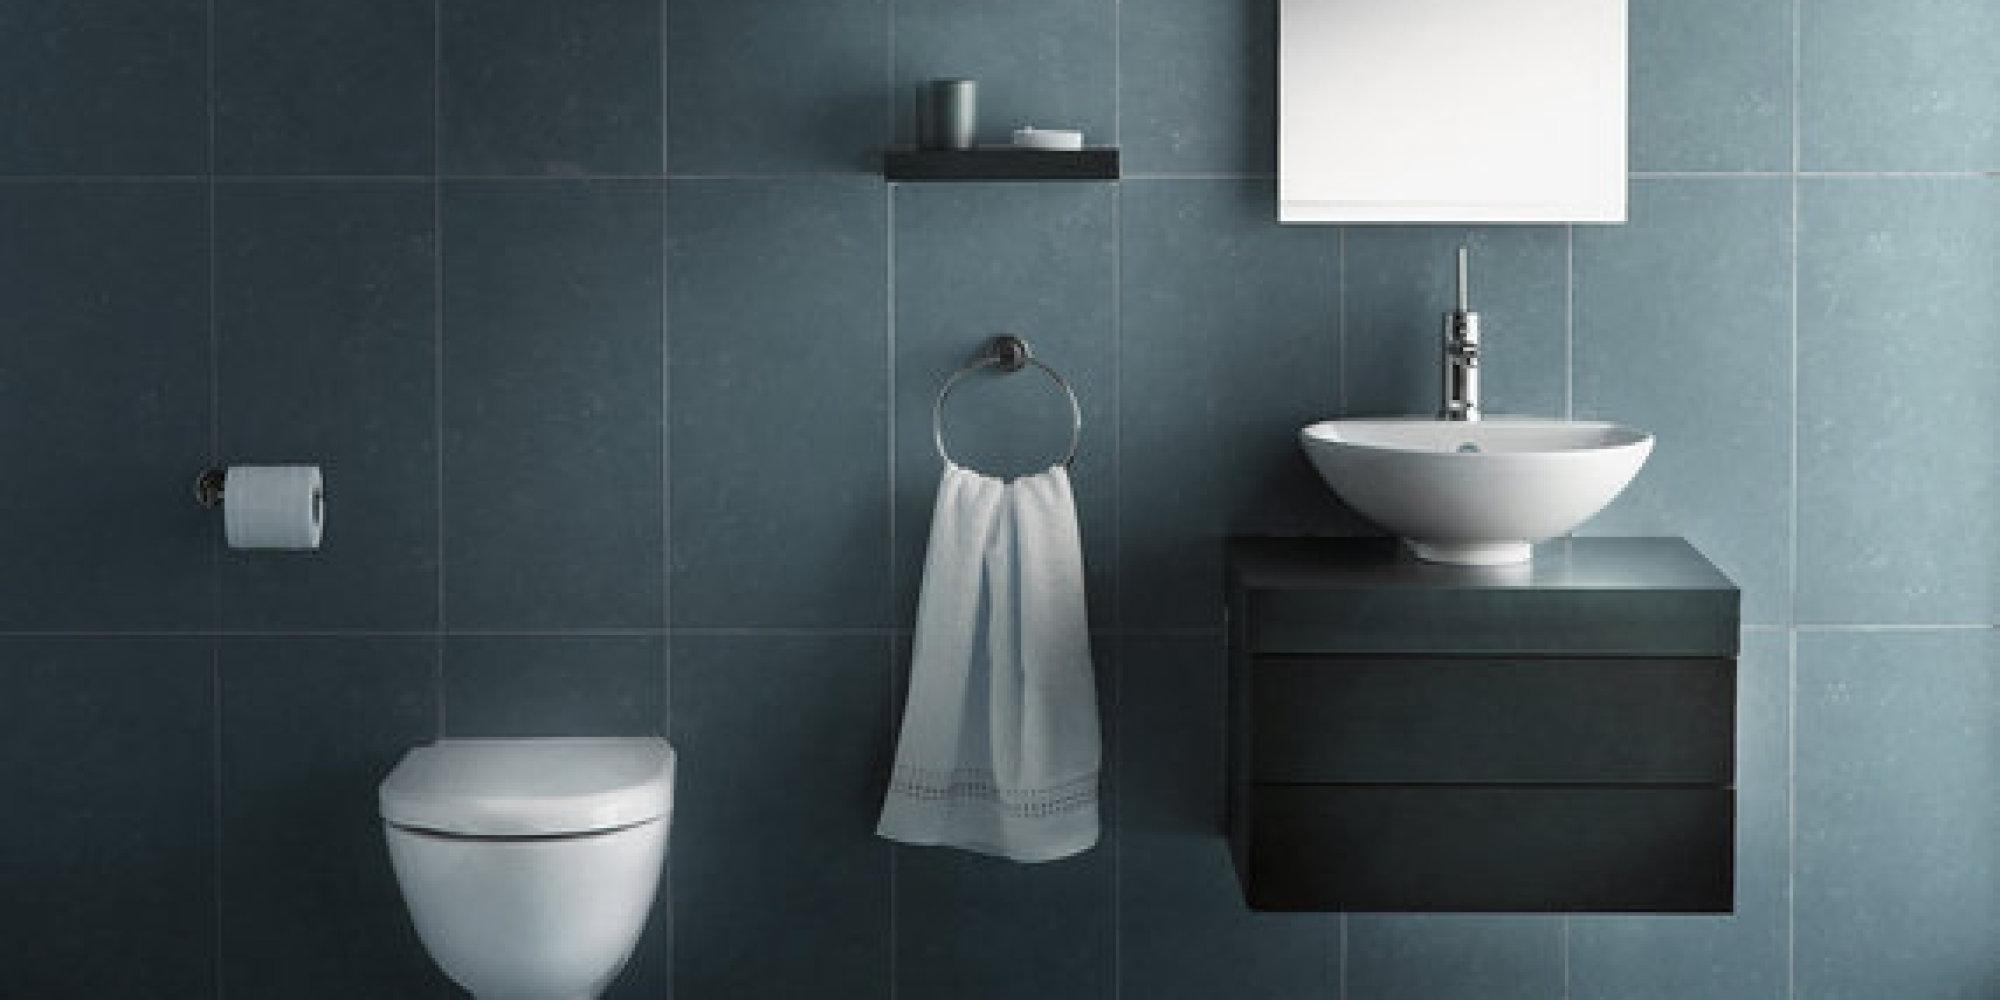 7 Remarkably Clever Bathroom Hacks  HuffPost